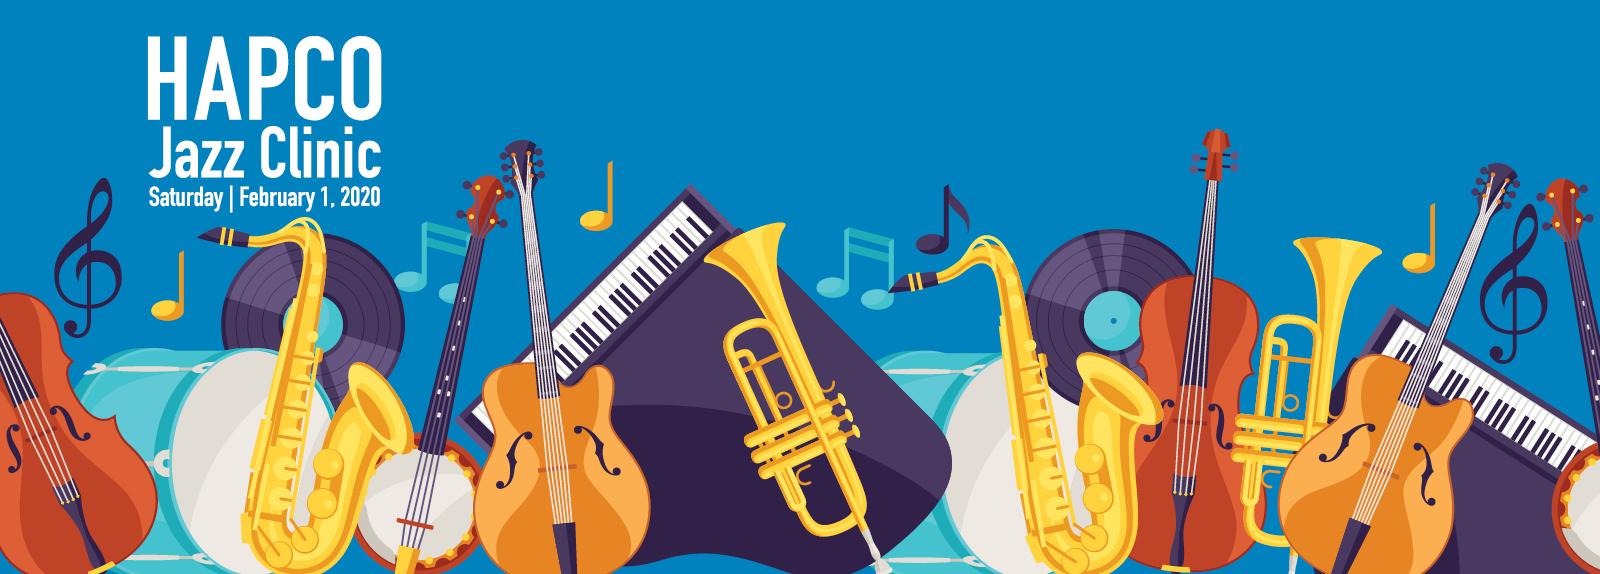 HAPCO Winter Jazz Clinic 2020